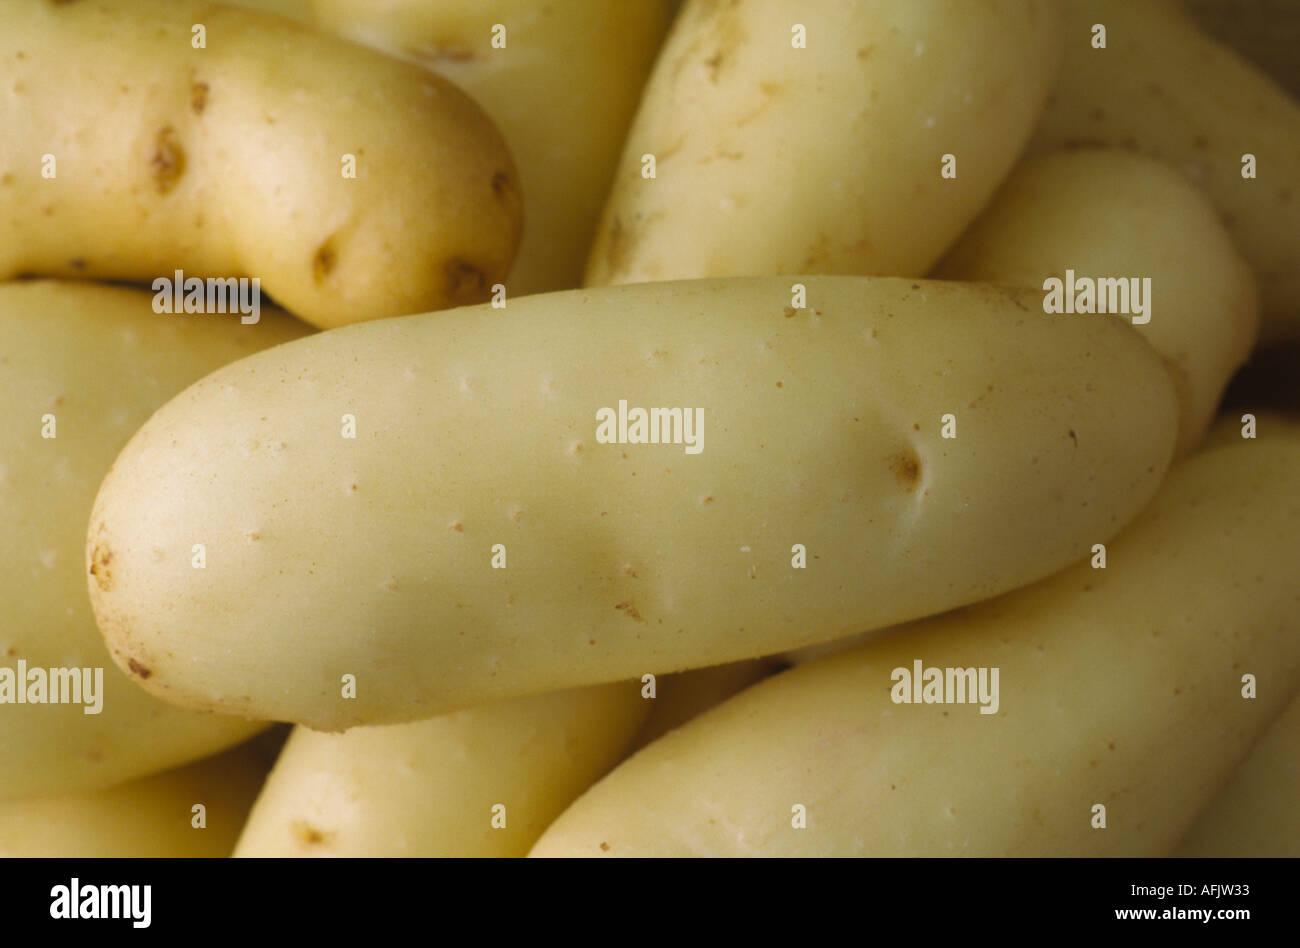 Solanum tuberosum 'Ratte'. AGM Washed early maincrop potatoes Stock Photo